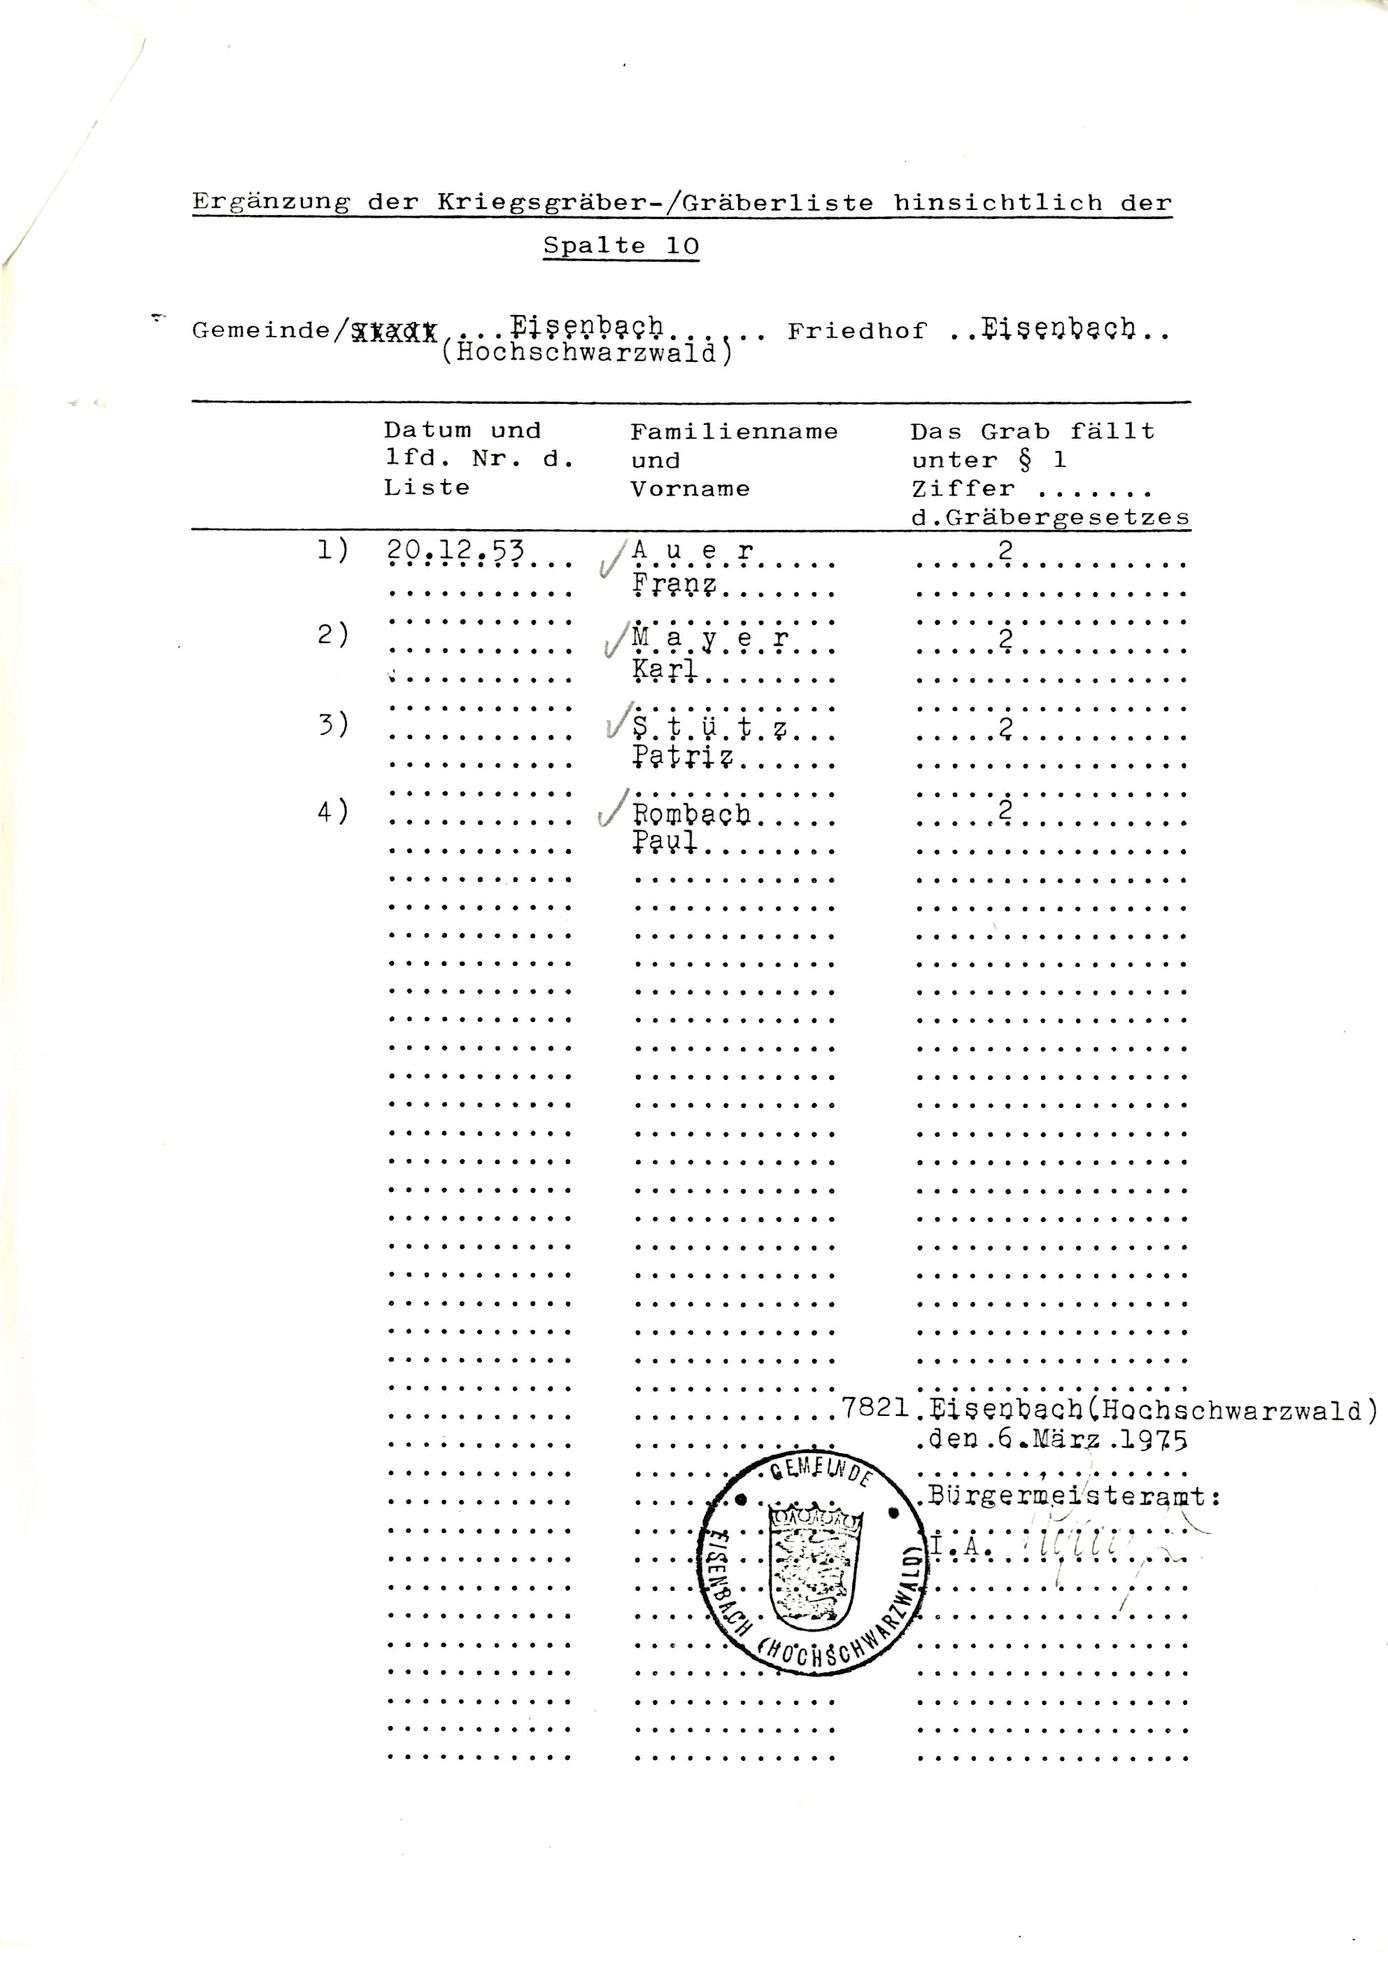 Eisenbach, Bild 2